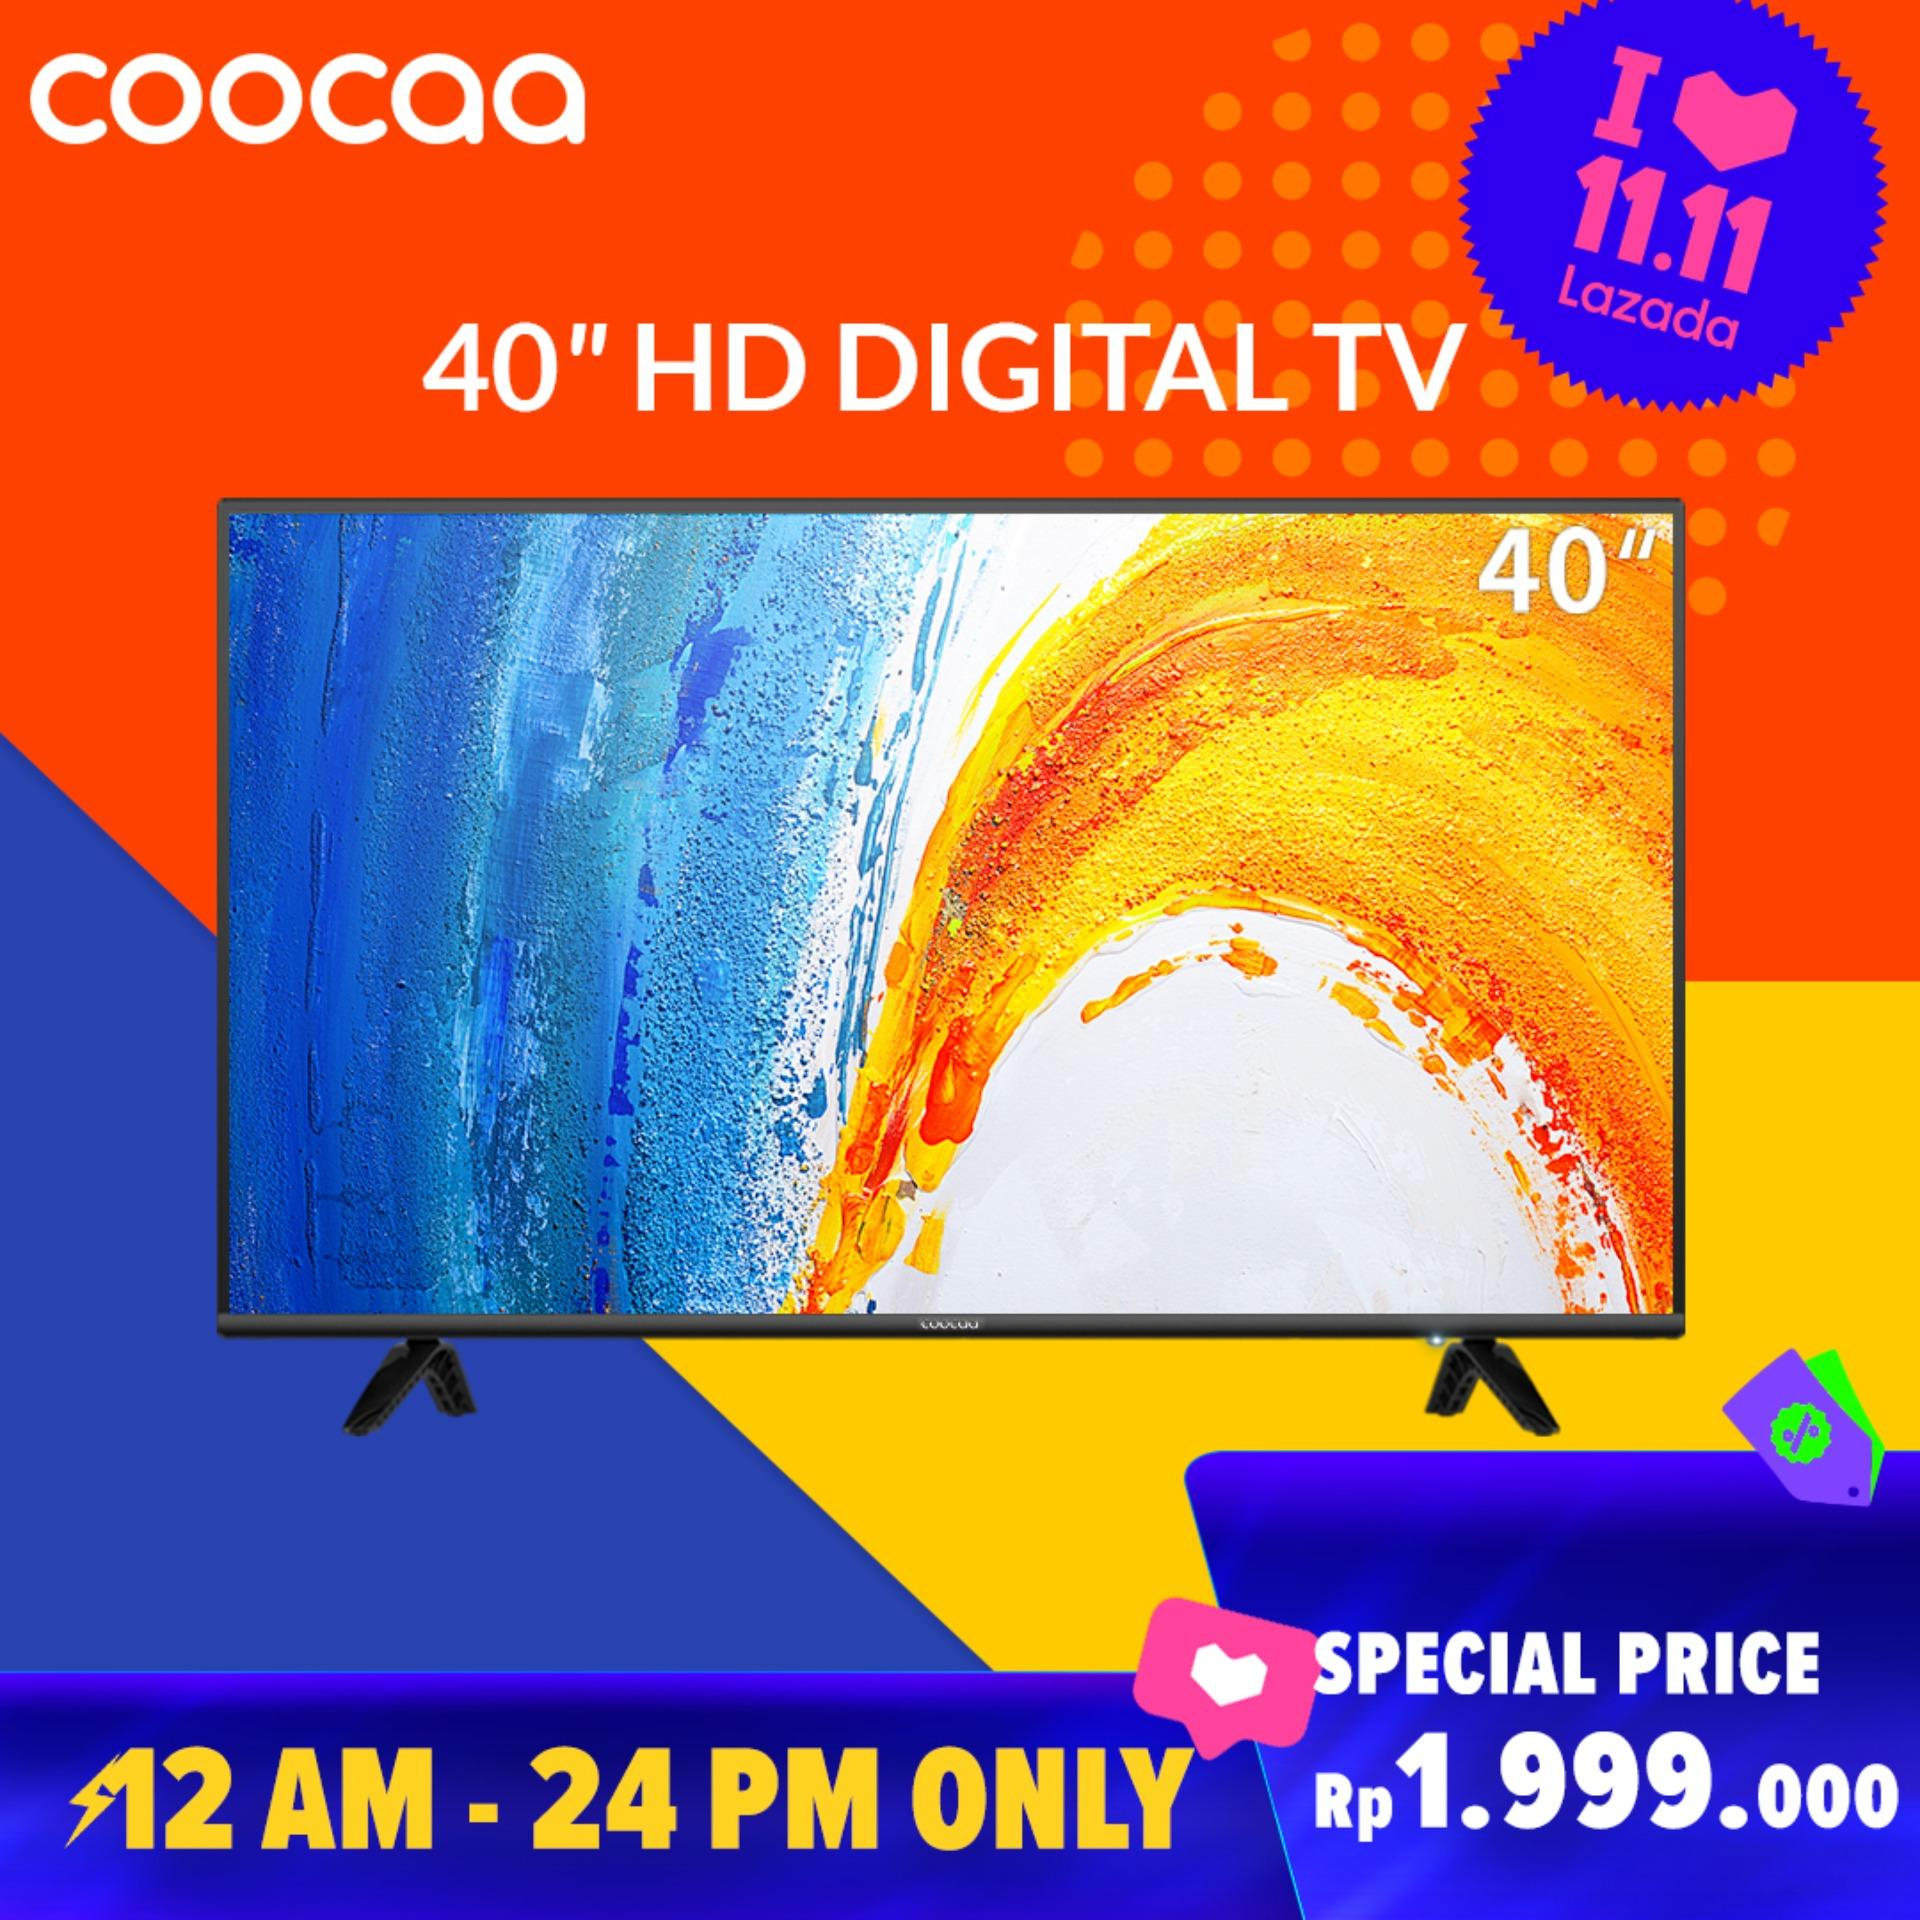 COOCAA LED TV 40 inch - Full HD Panel - Slim - USB/HDMI (Model : 40D5A)